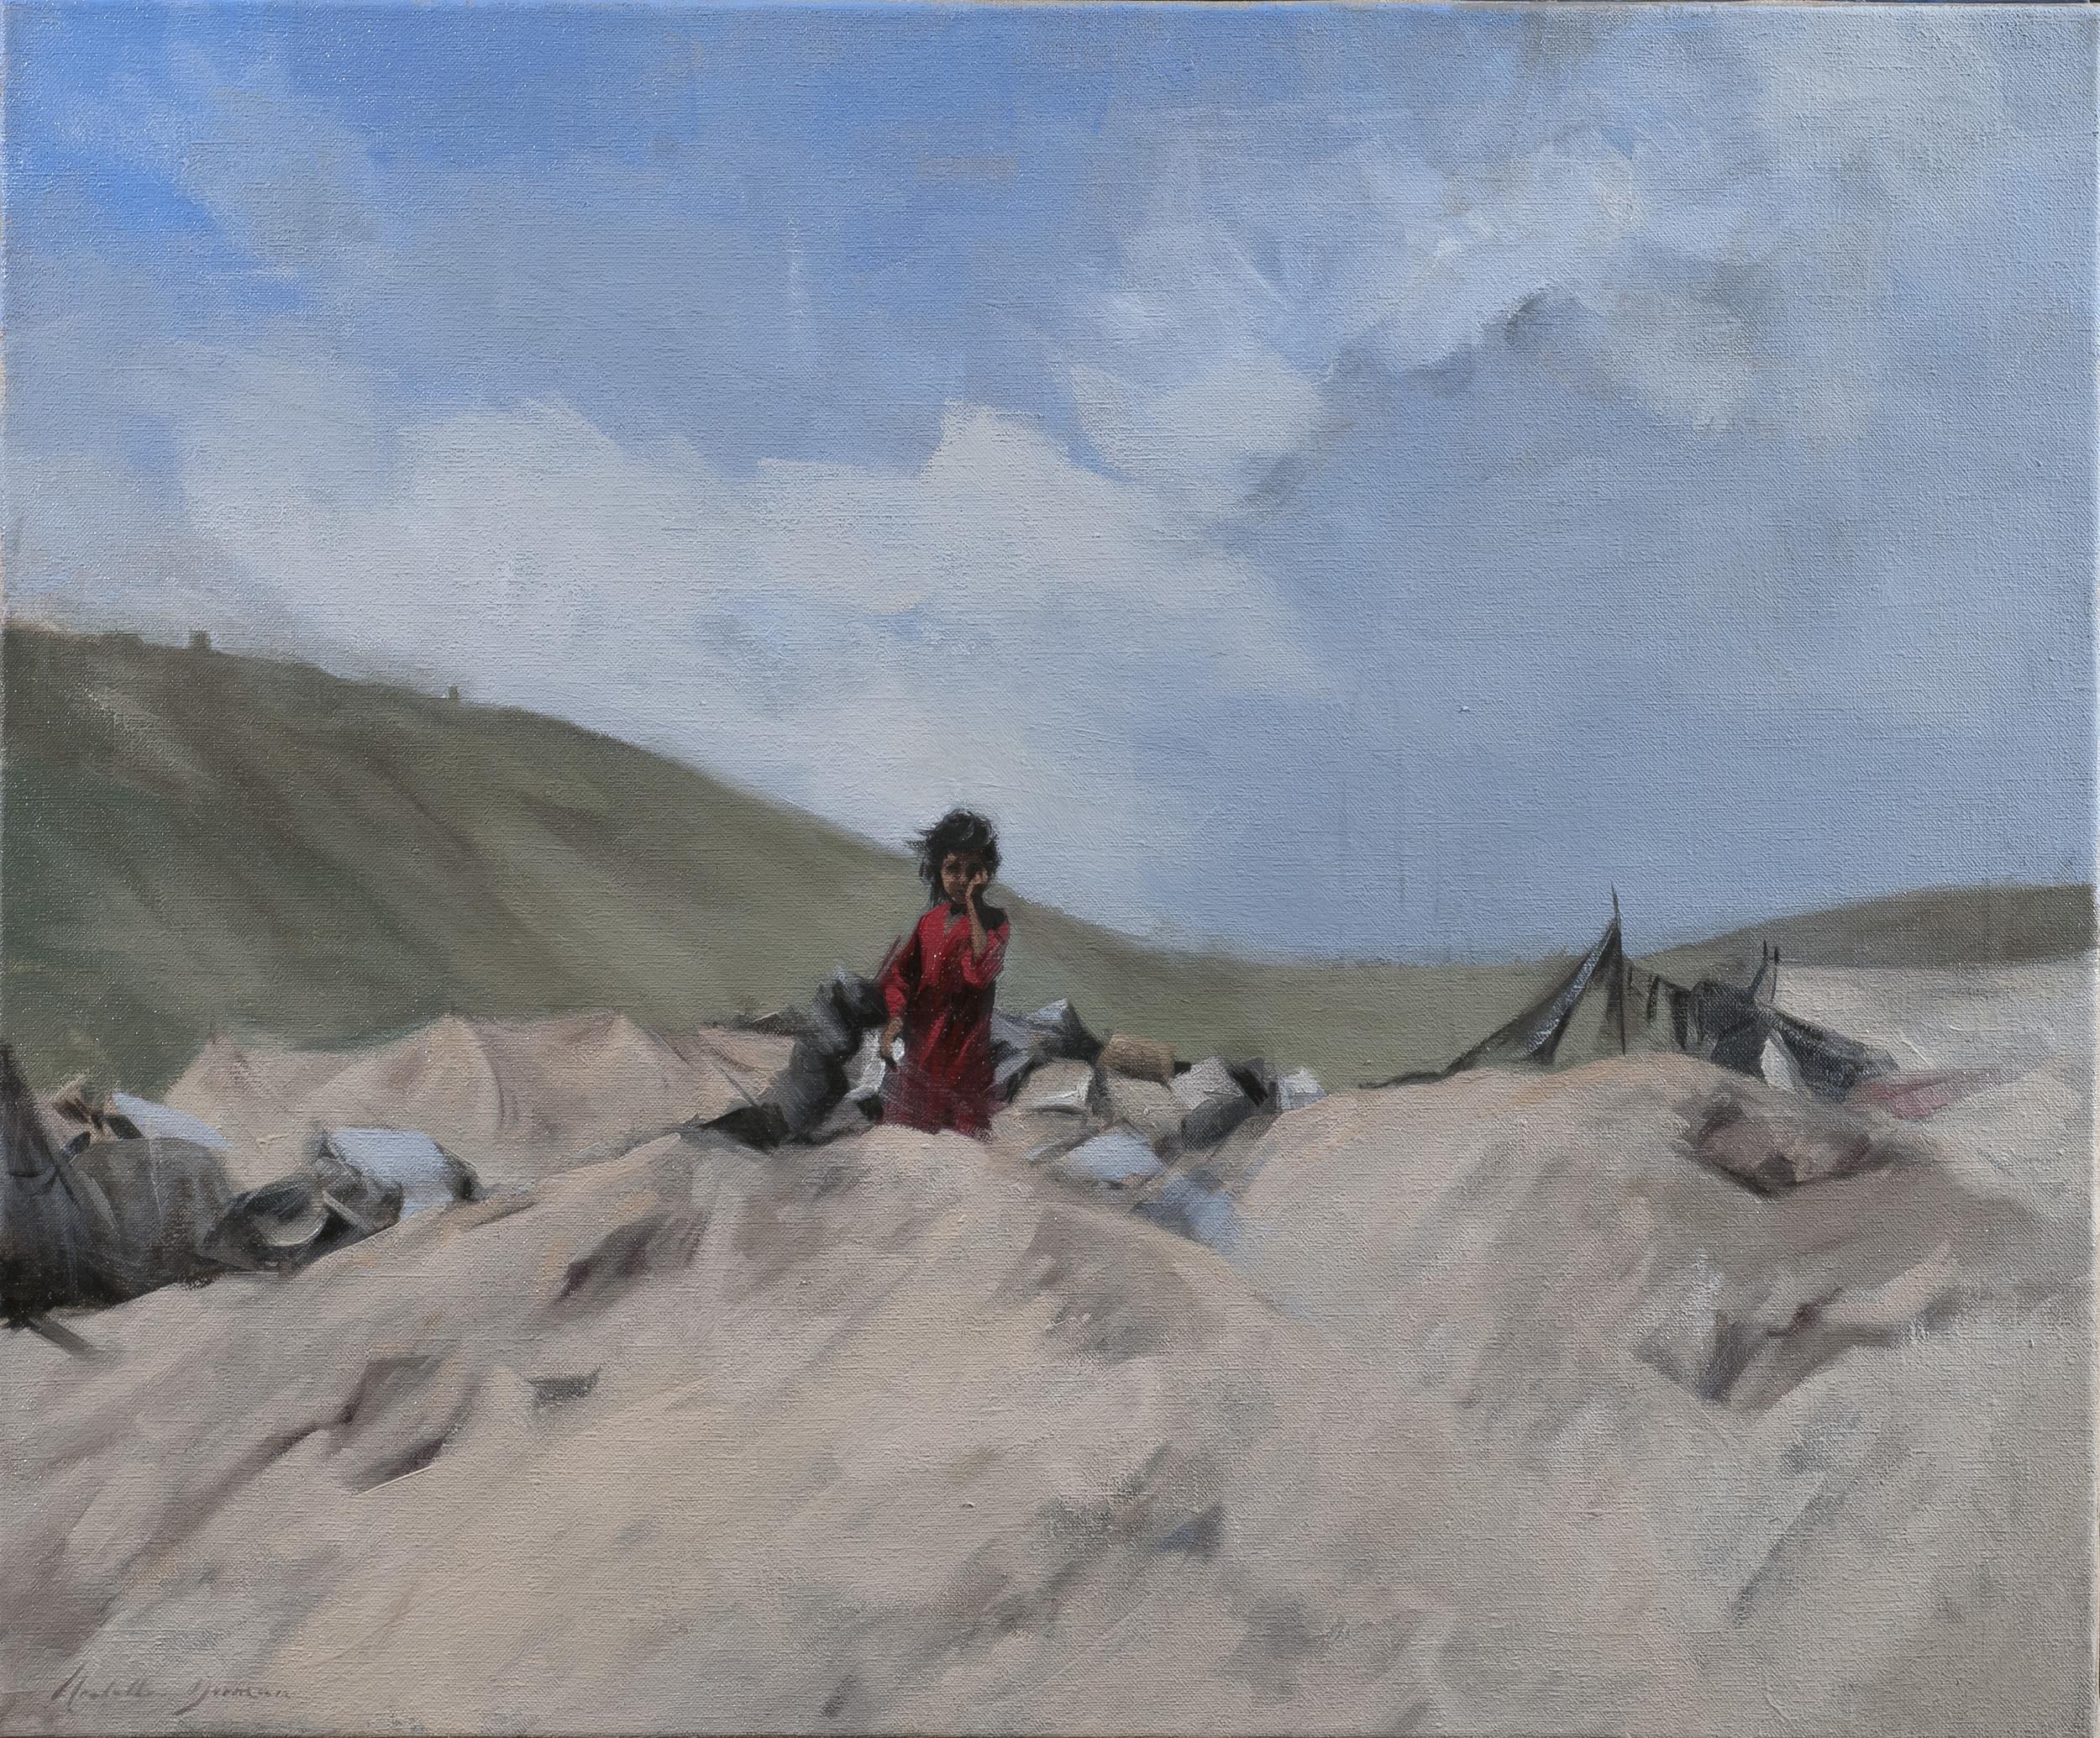 The Ragpicker, Afghanistan